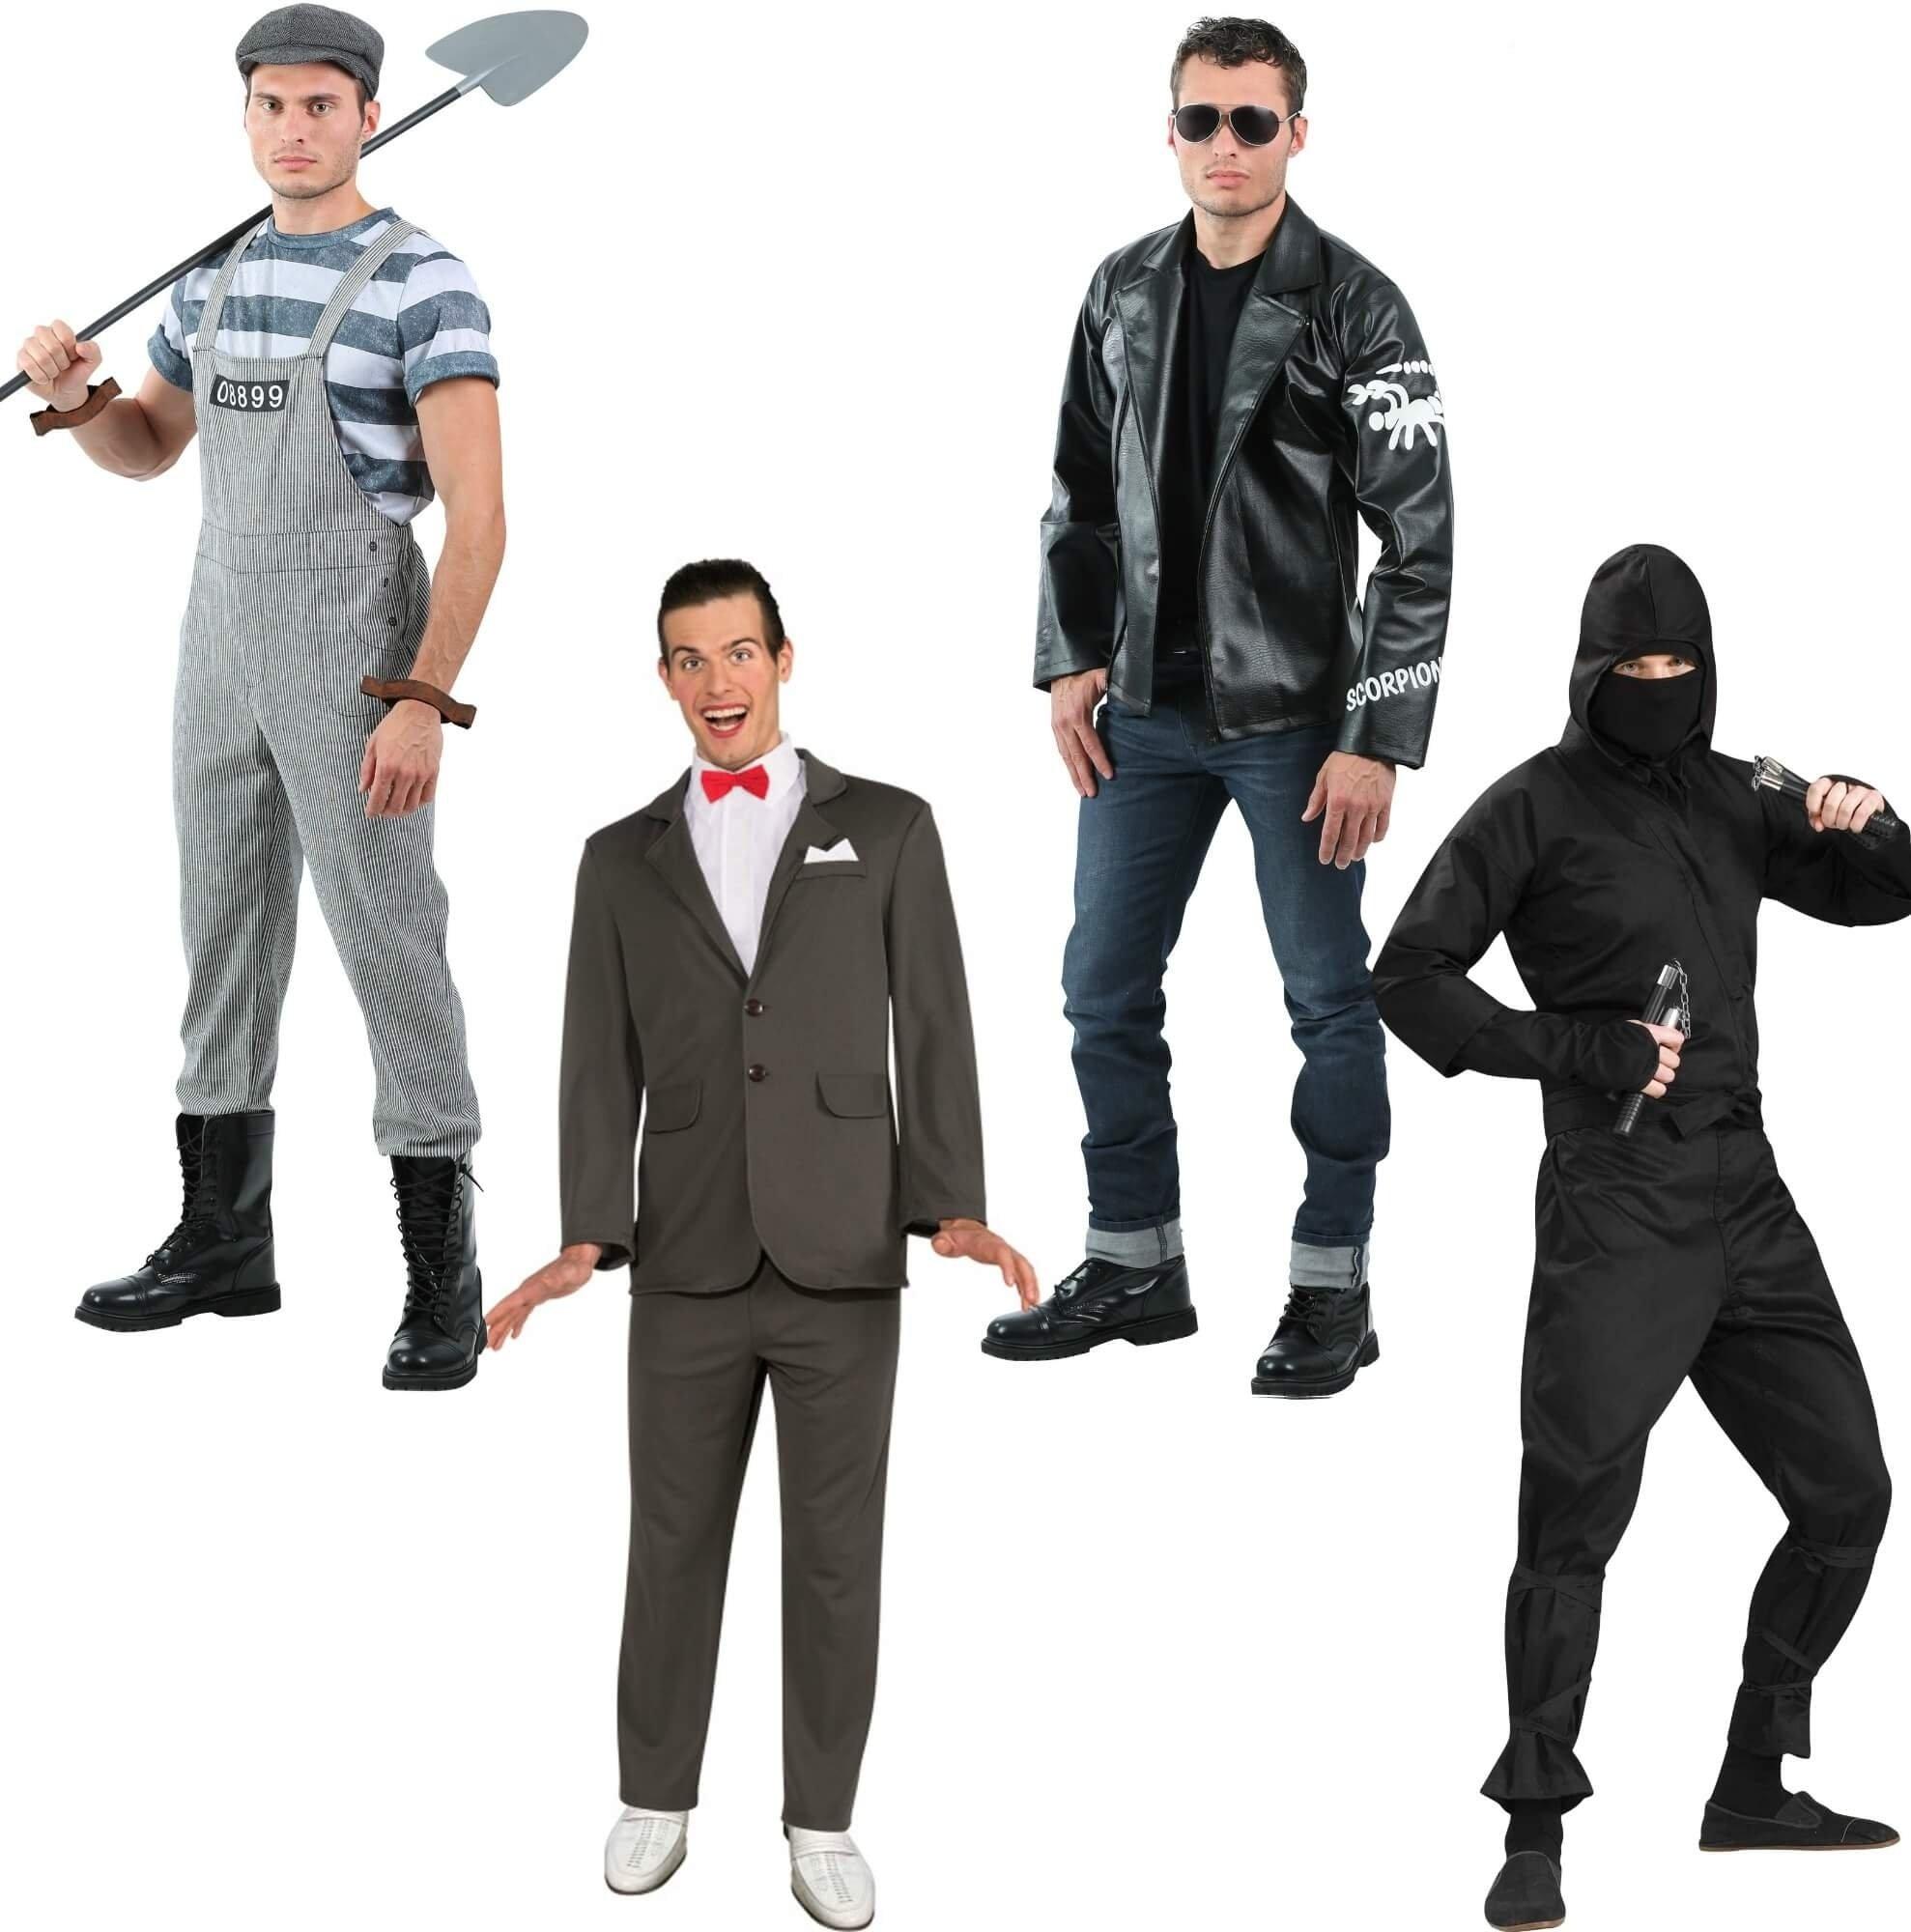 10 Stunning Cheap Mens Halloween Costume Ideas cheap halloween costume ideas halloween costumes blog 2020